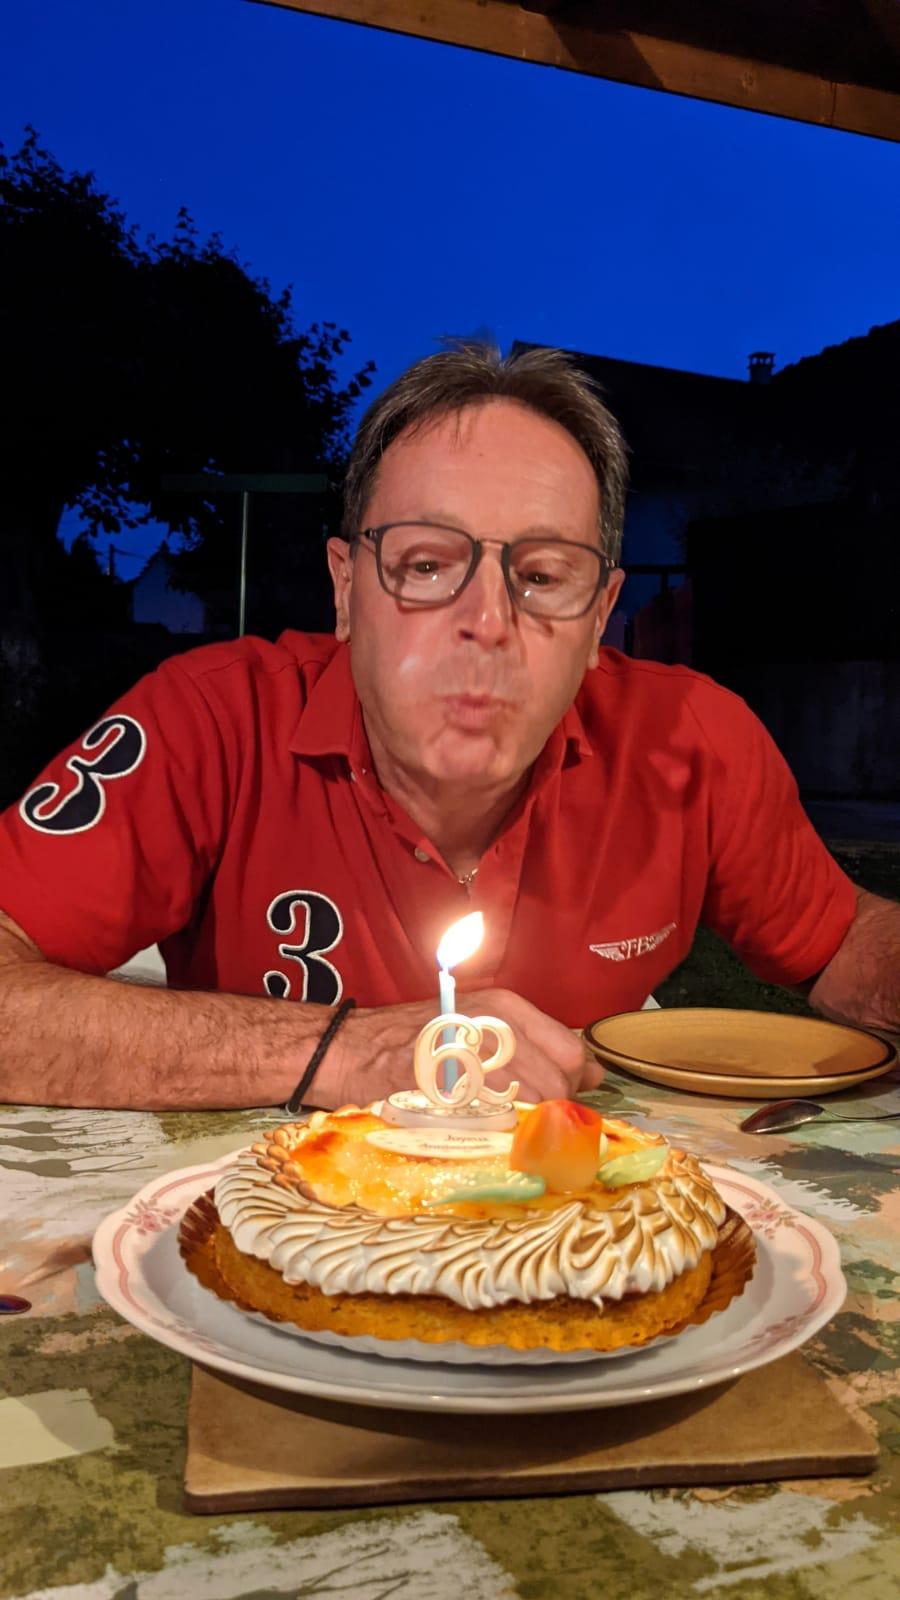 Joyeux anniversaire Ayrton et serpent Img-2076